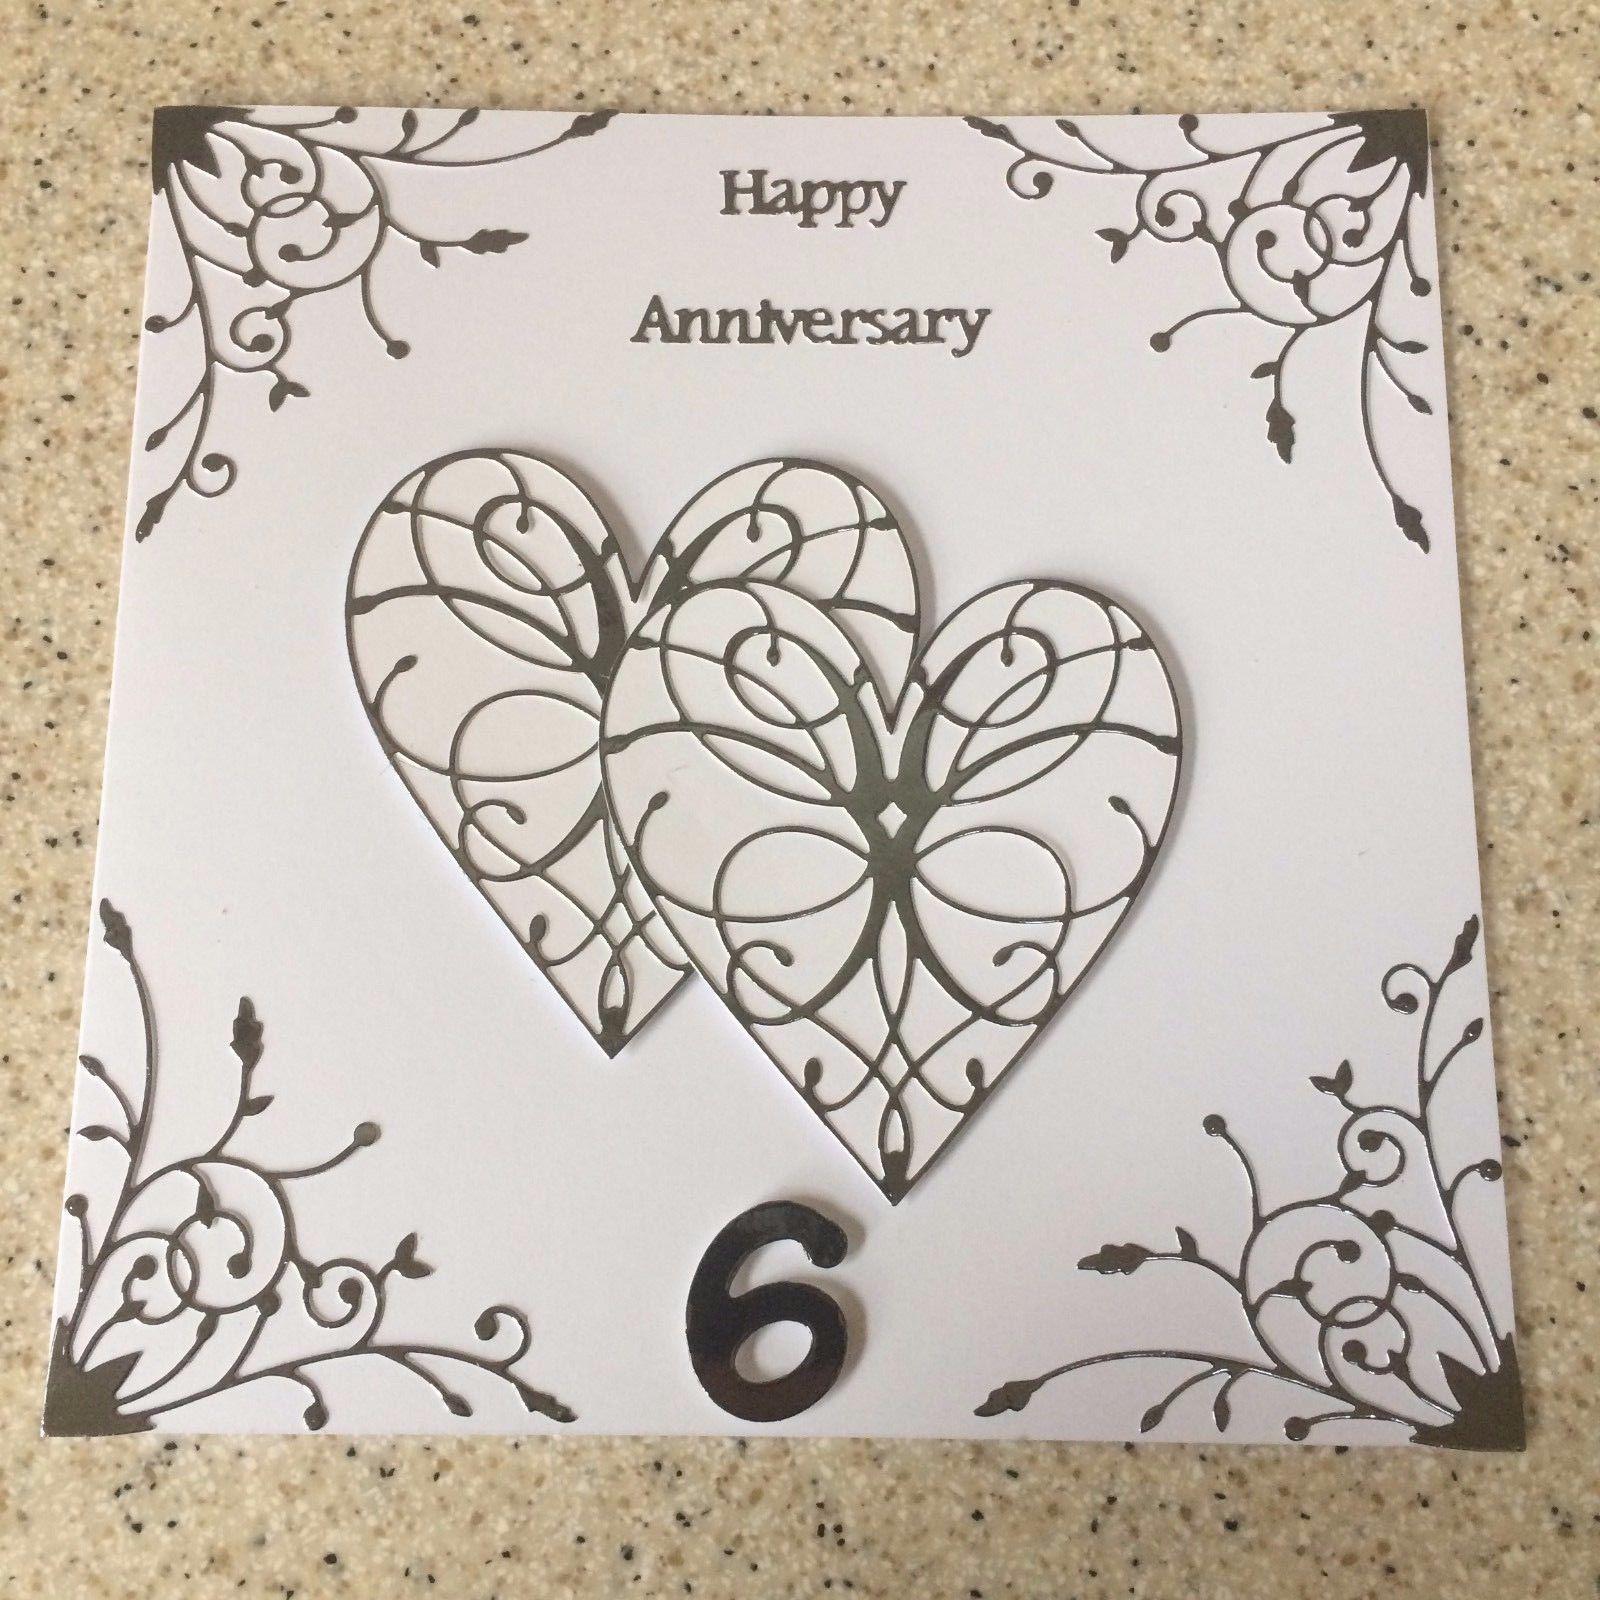 £4.5 GBP Handmade Iron Wedding Anniversary Card Happy